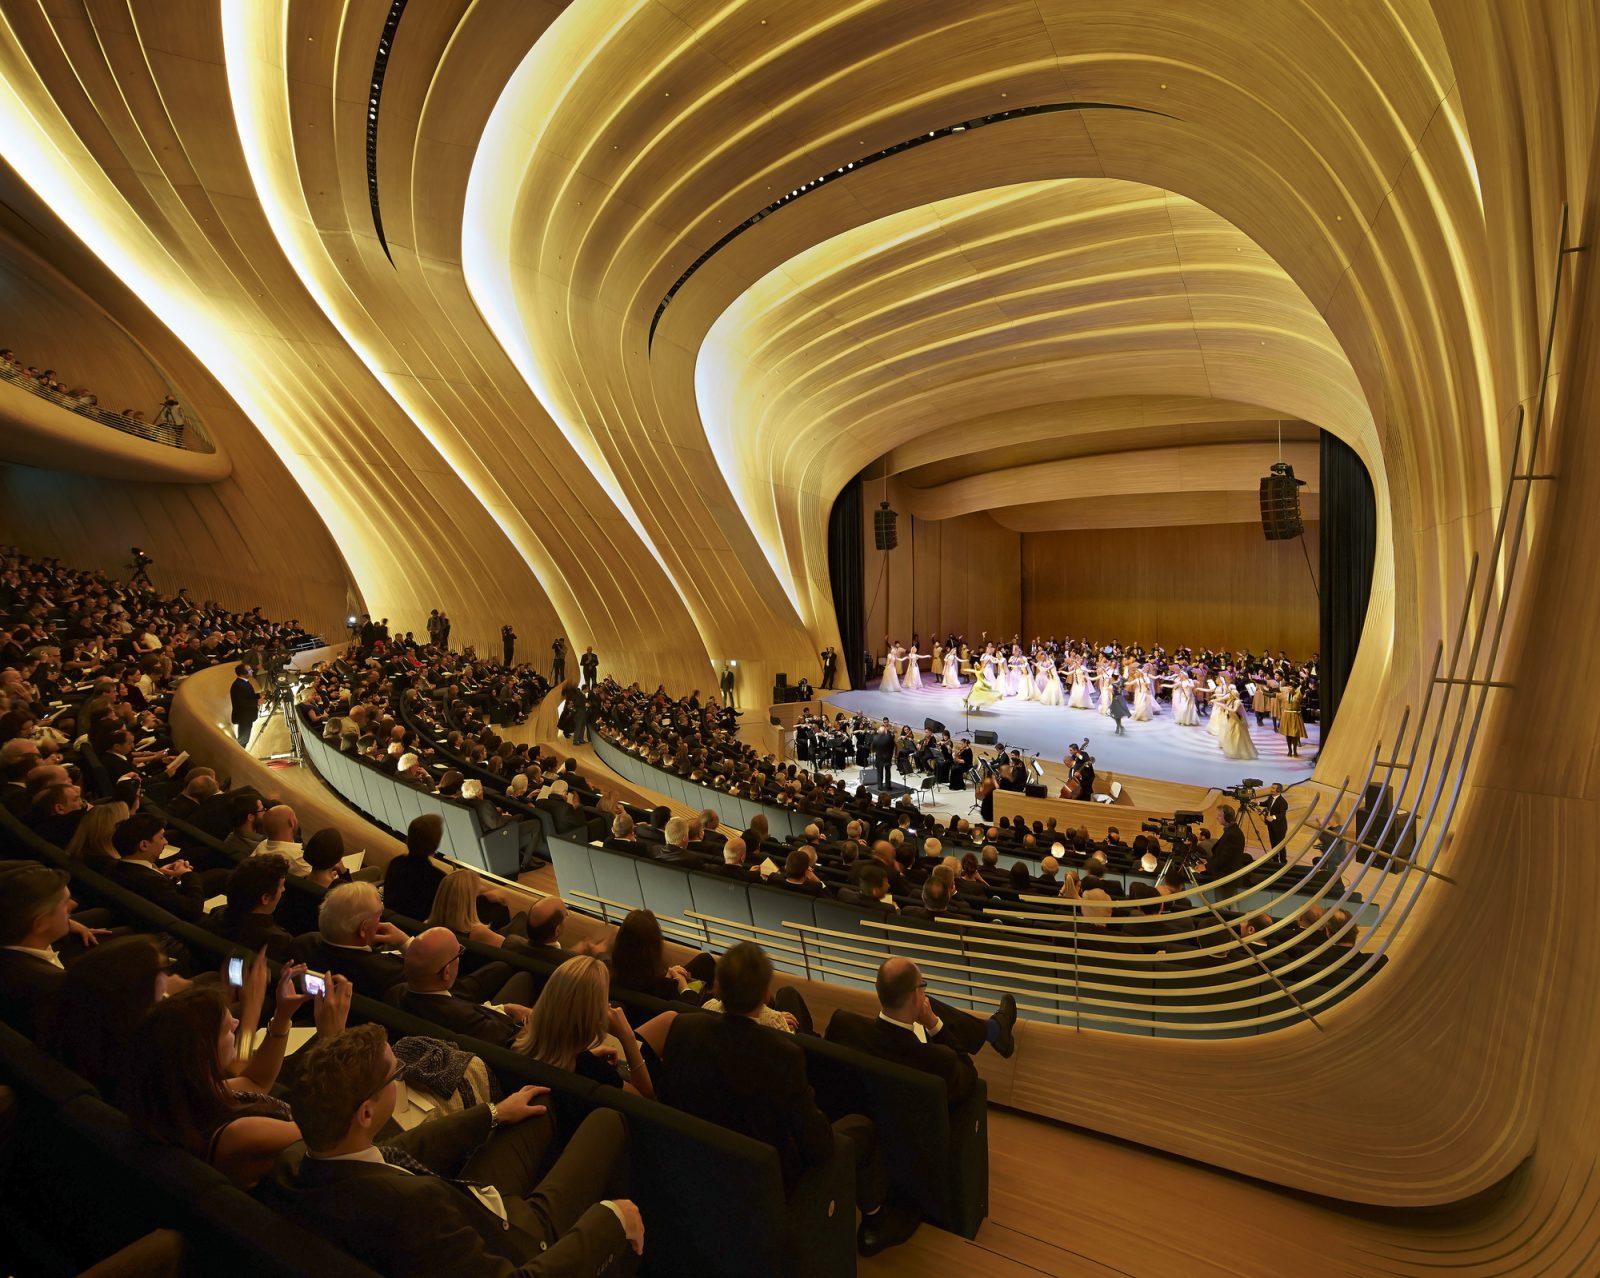 концертный зал Центра Гейдара Алиева в Баку проект Захи Хадид